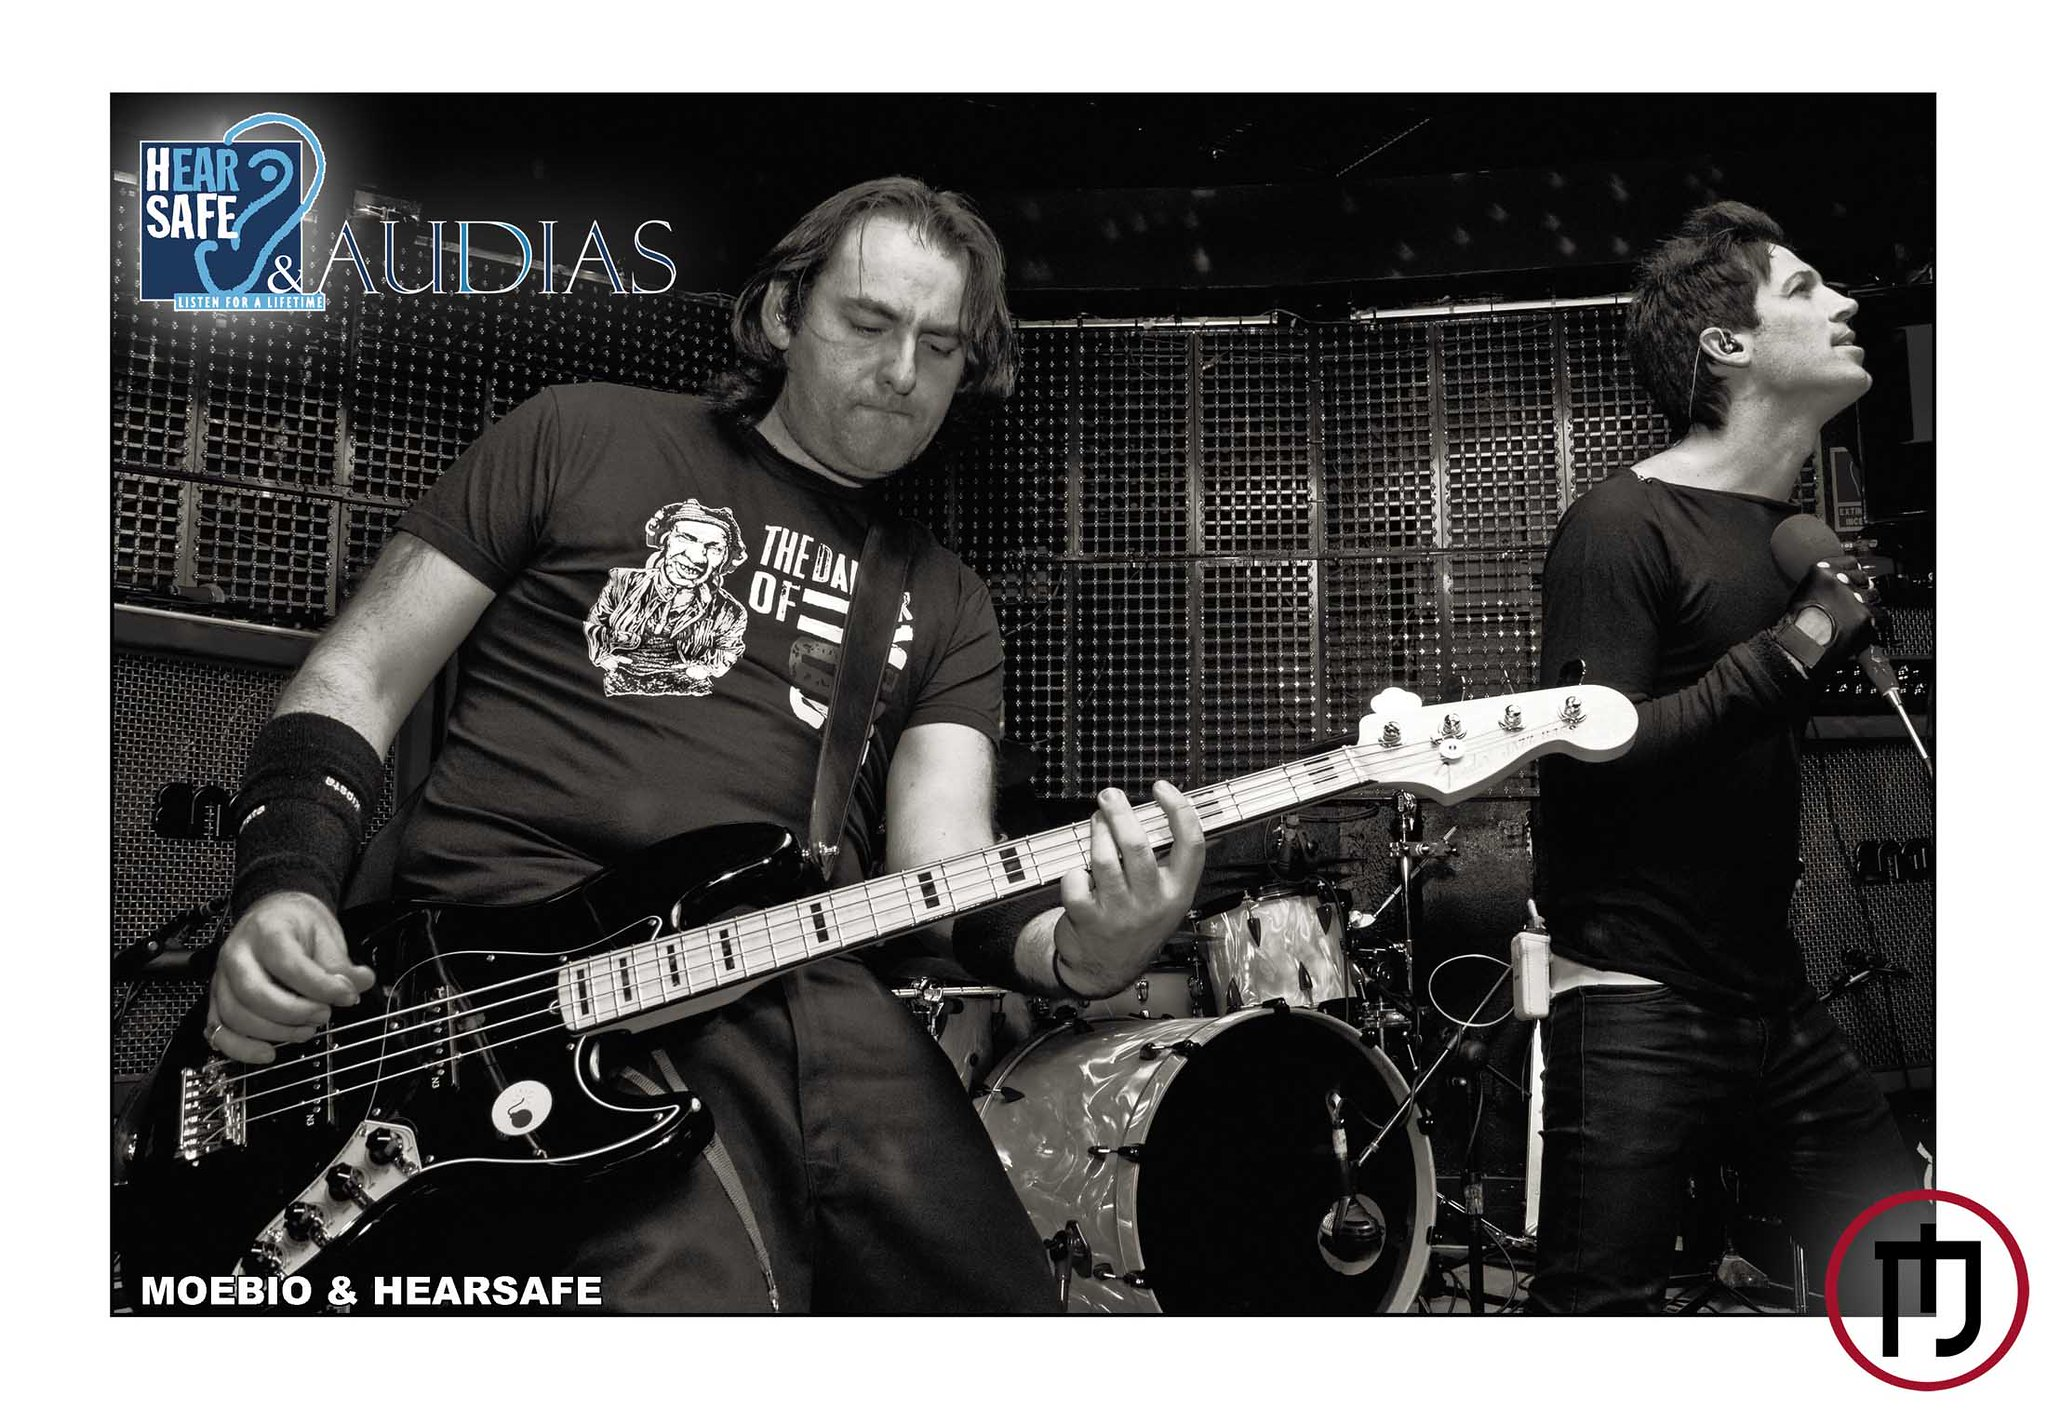 MOEBIO & HEARSAFE